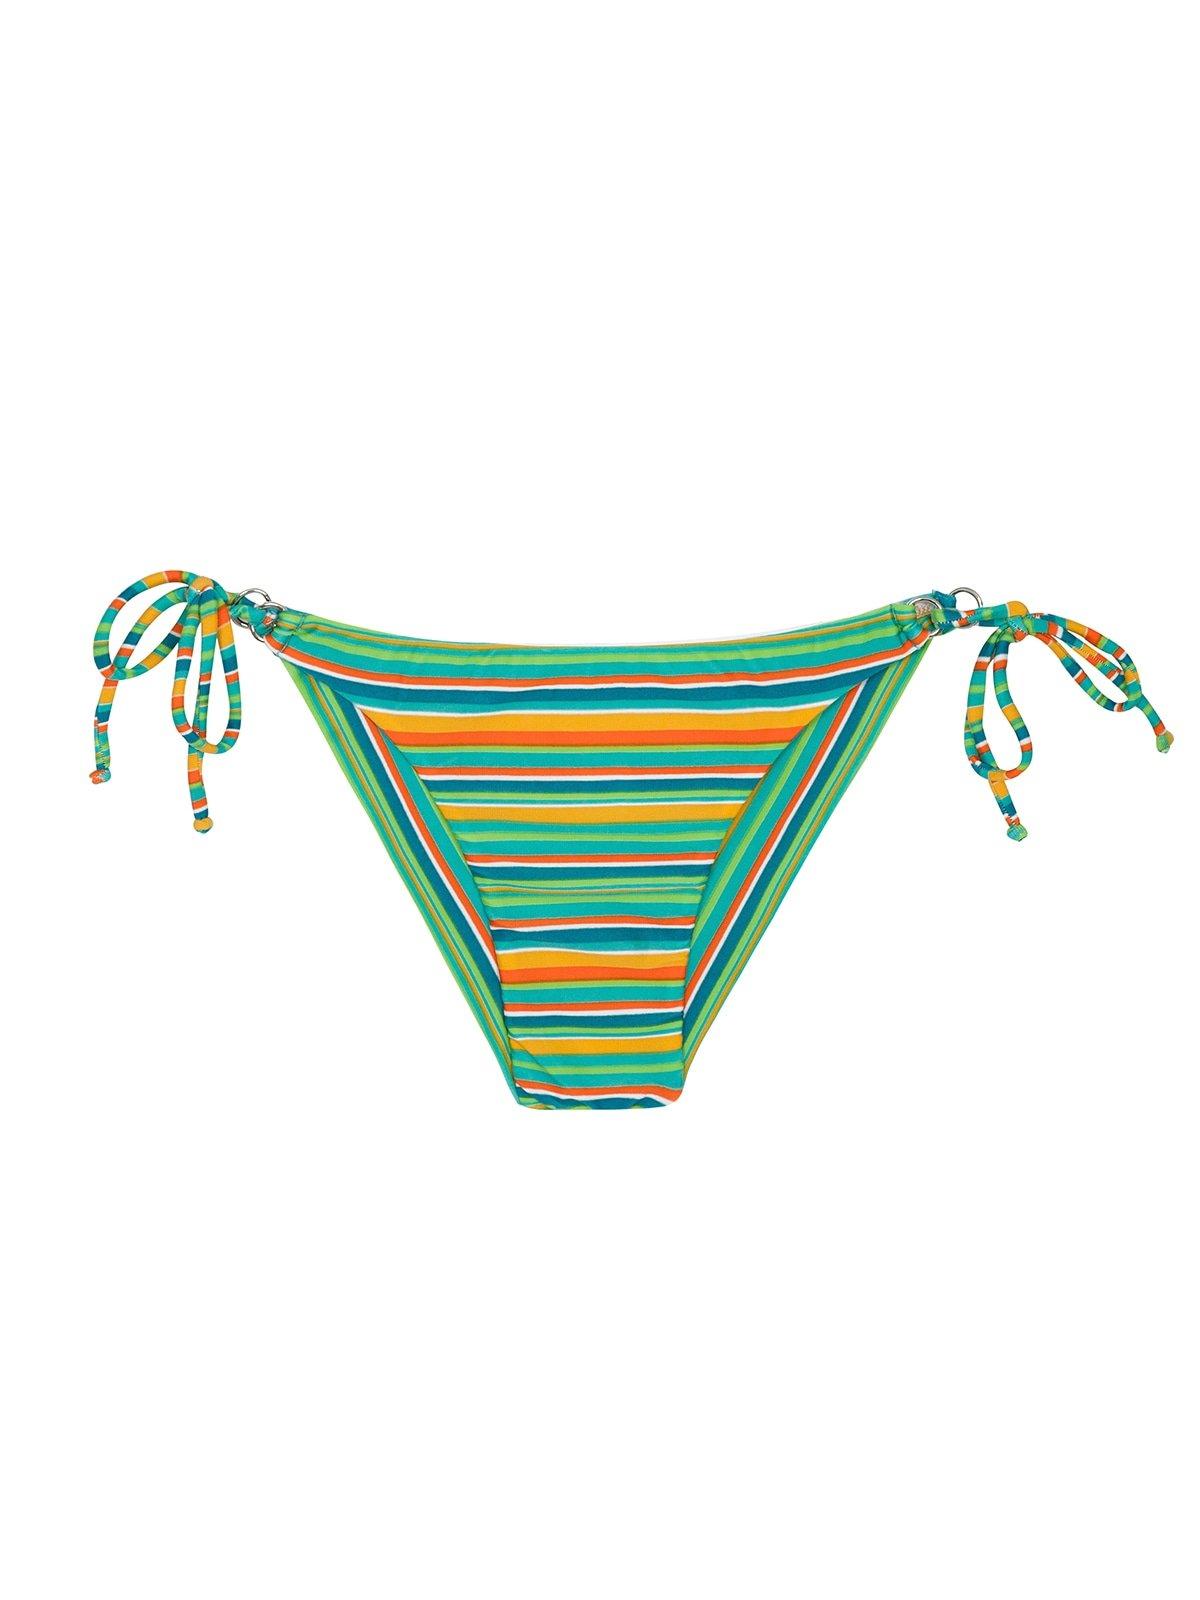 26a454913d1 Striped Brazilian bikini bottom with side ties - CALCINHA LEI CHEEKY ...